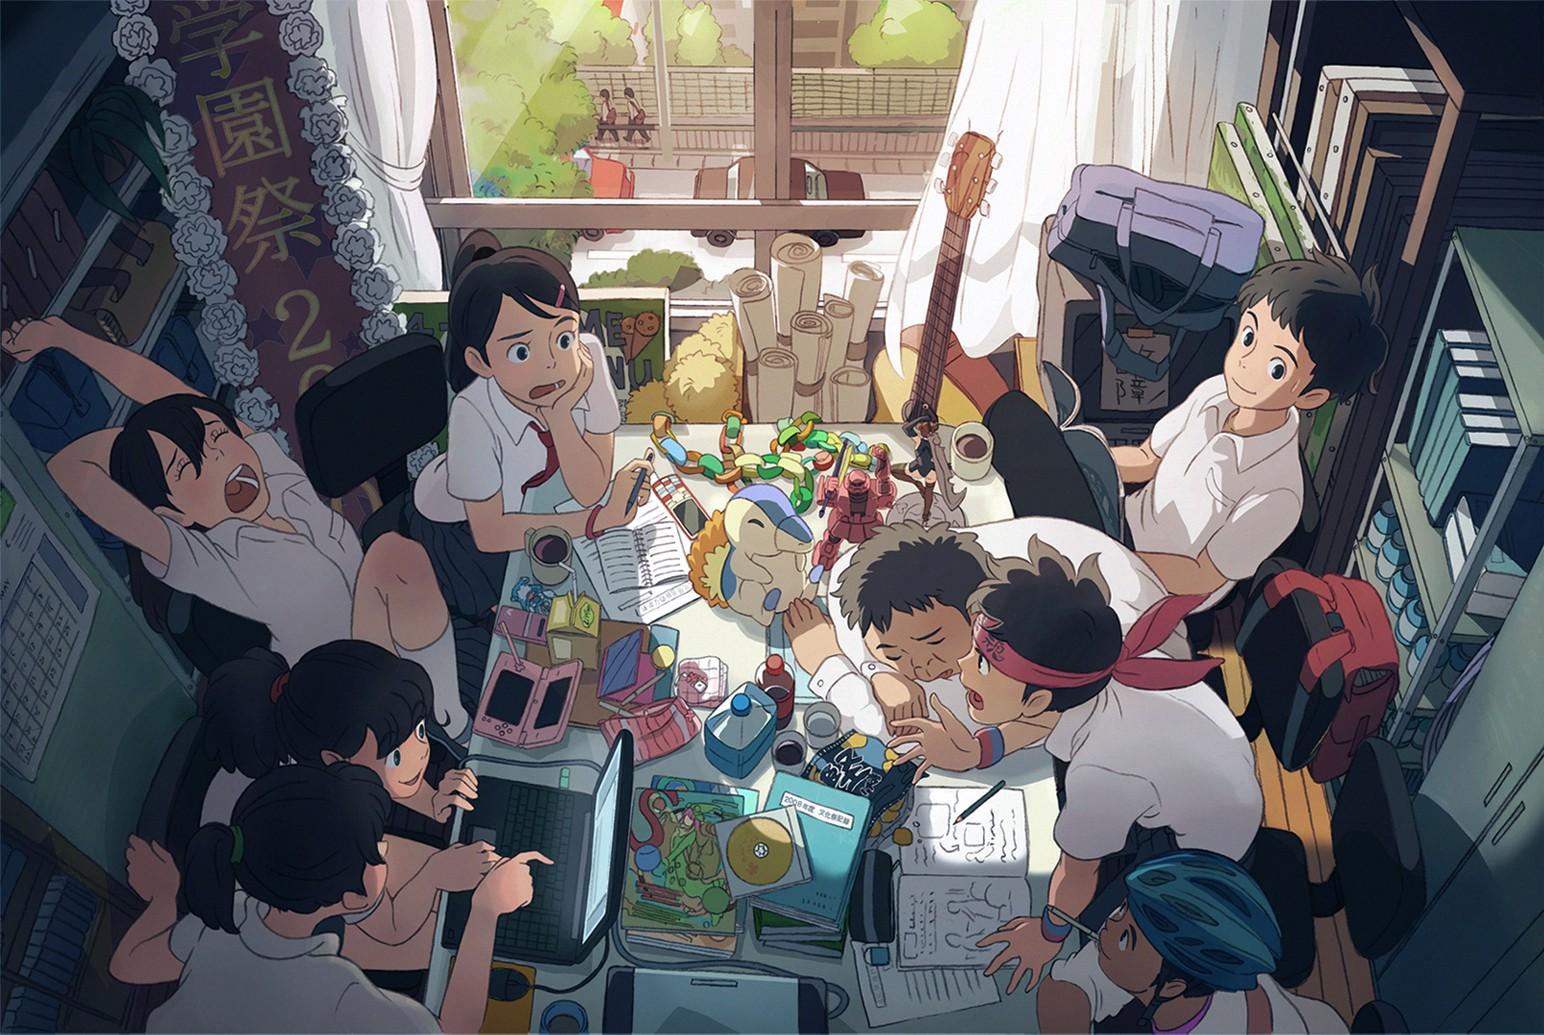 anime, Pok mon, original characters, Gundam, Japanese, comics, peaceful, bliss, peace, Friends, Nintendo DS, Zaku II, ART